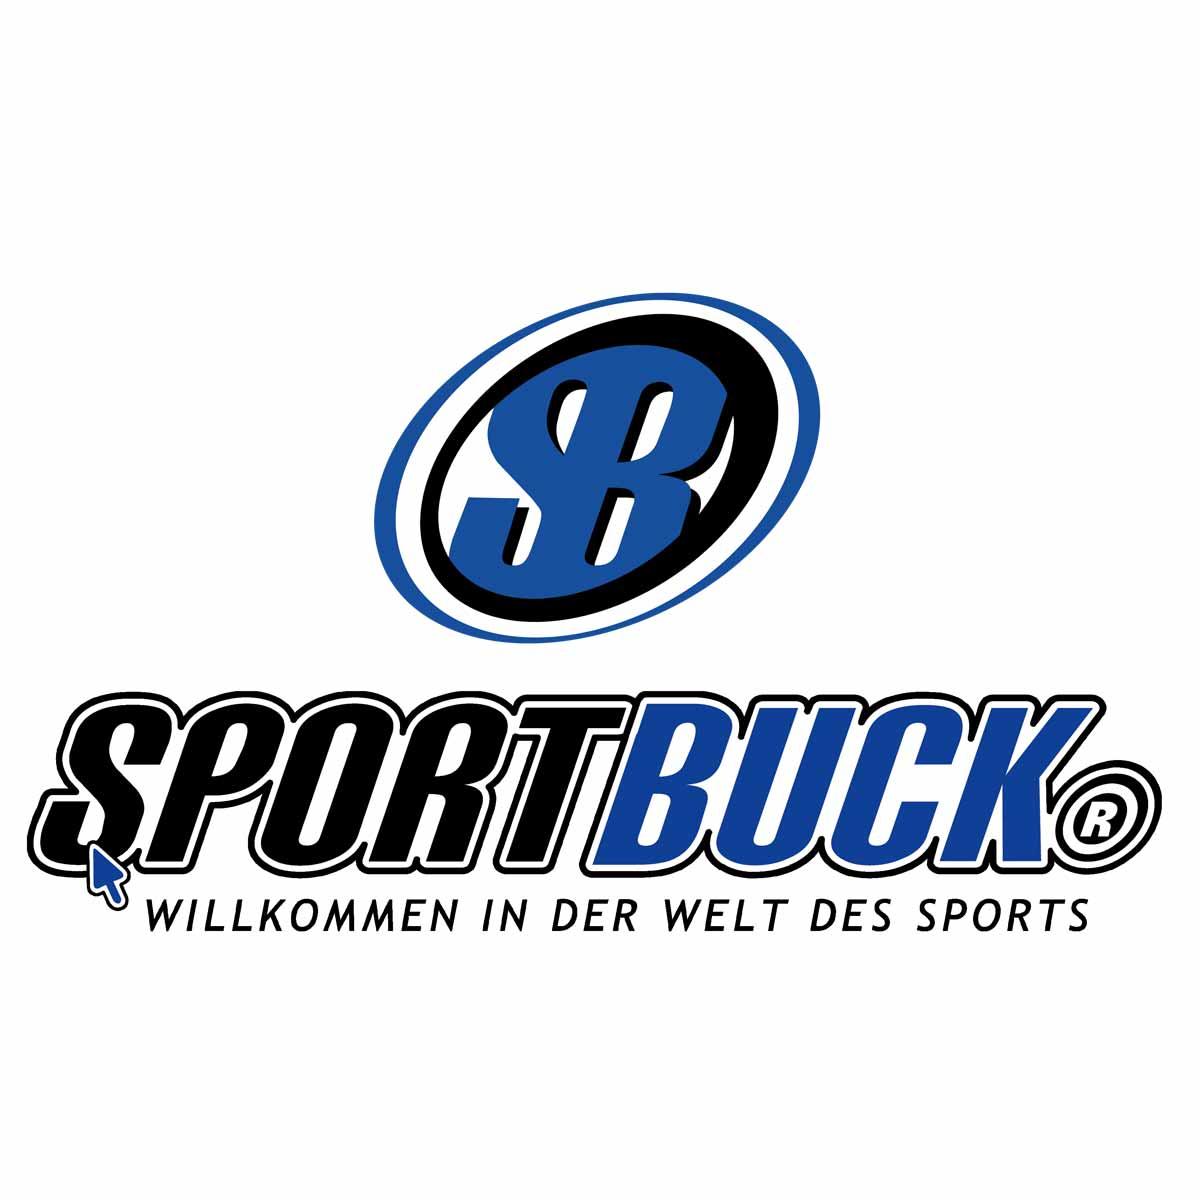 Cable Kit Ultralite 6.0 Klettersteigset oasis